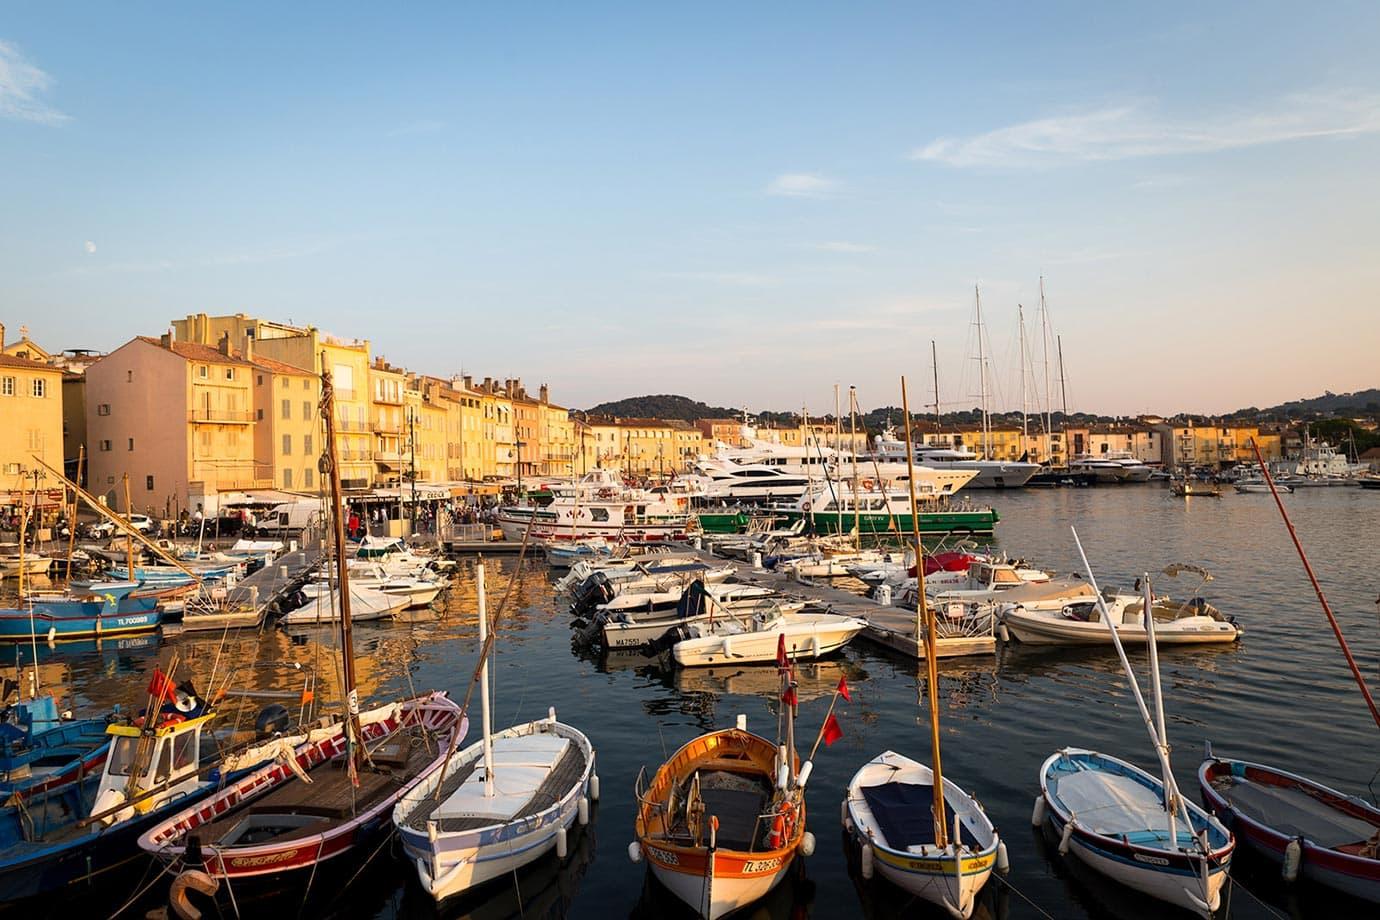 St Tropez Port (An Adventurous World)